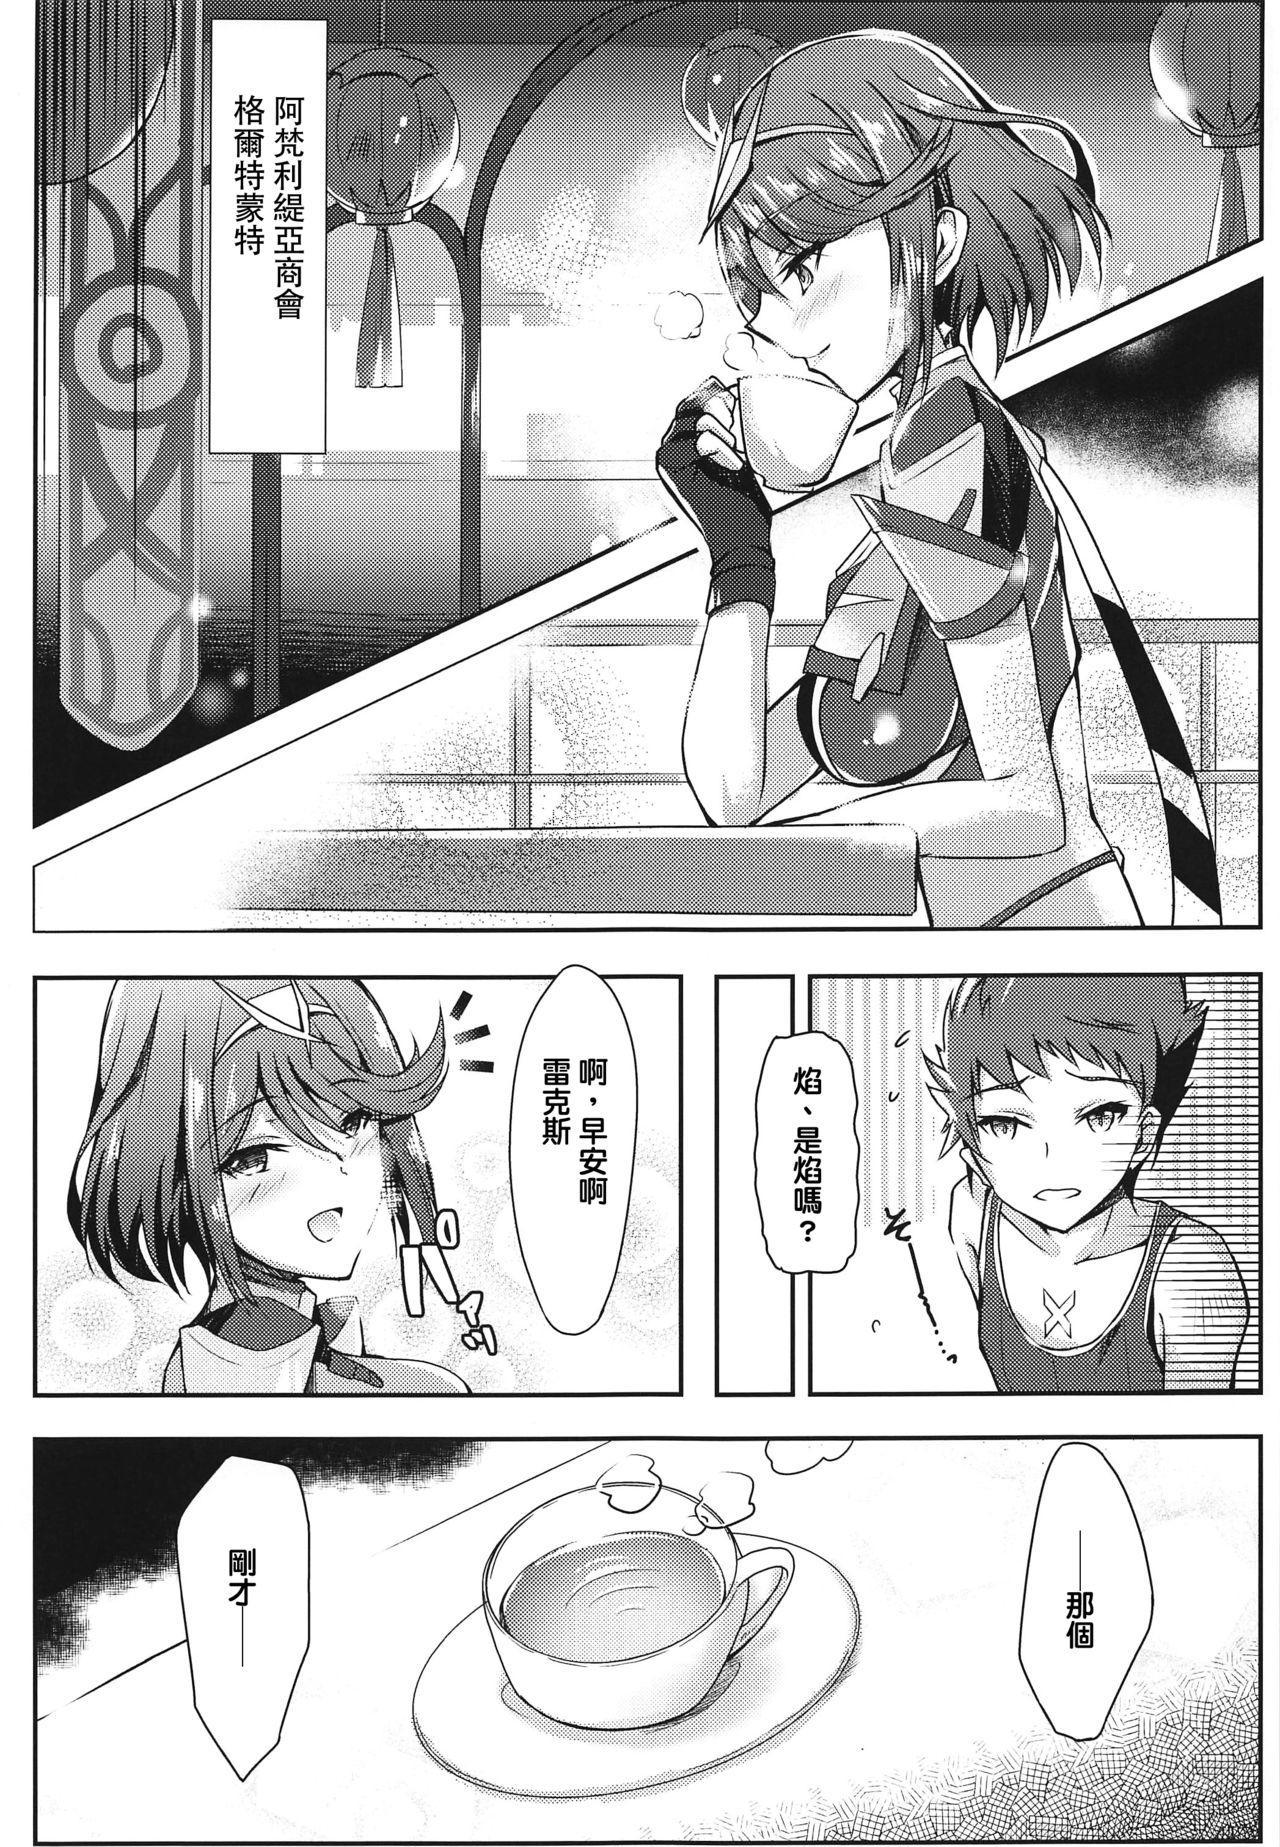 Homura-chan no Ecchi Hon 3